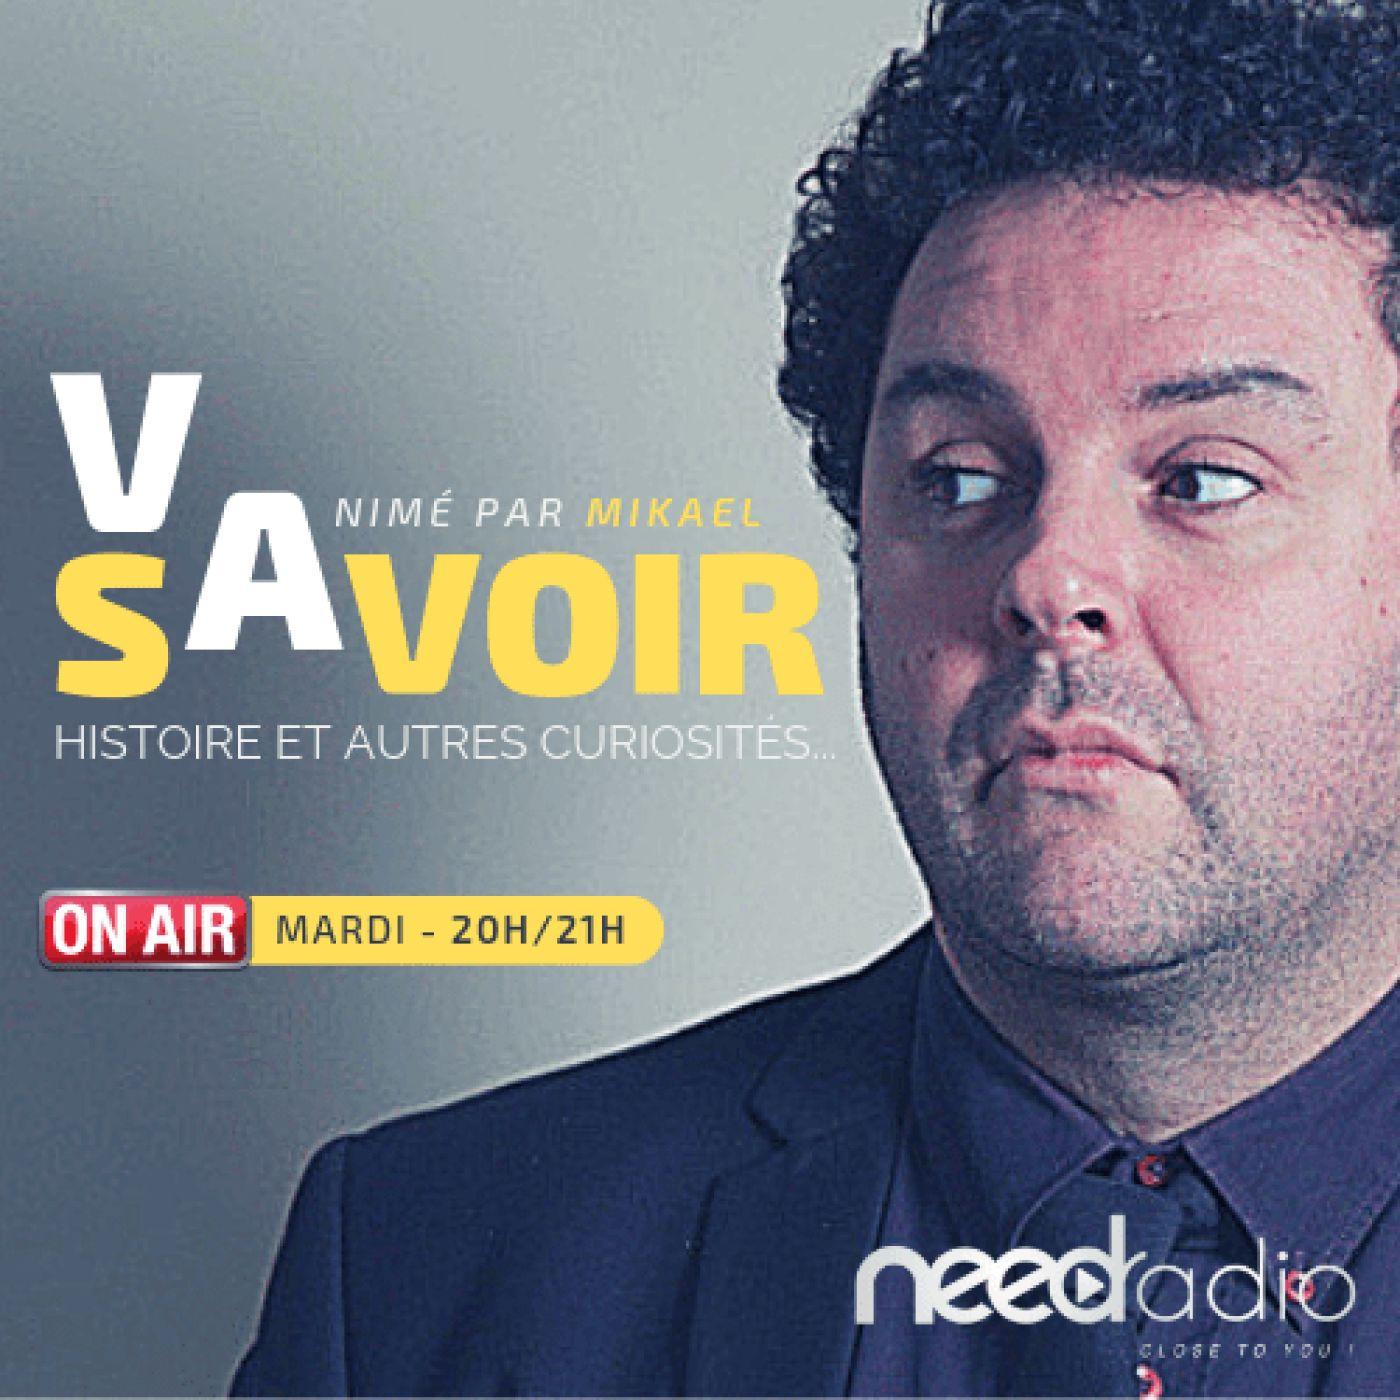 Va Savoir - Phobies (avec Mikael) (24/09/19)